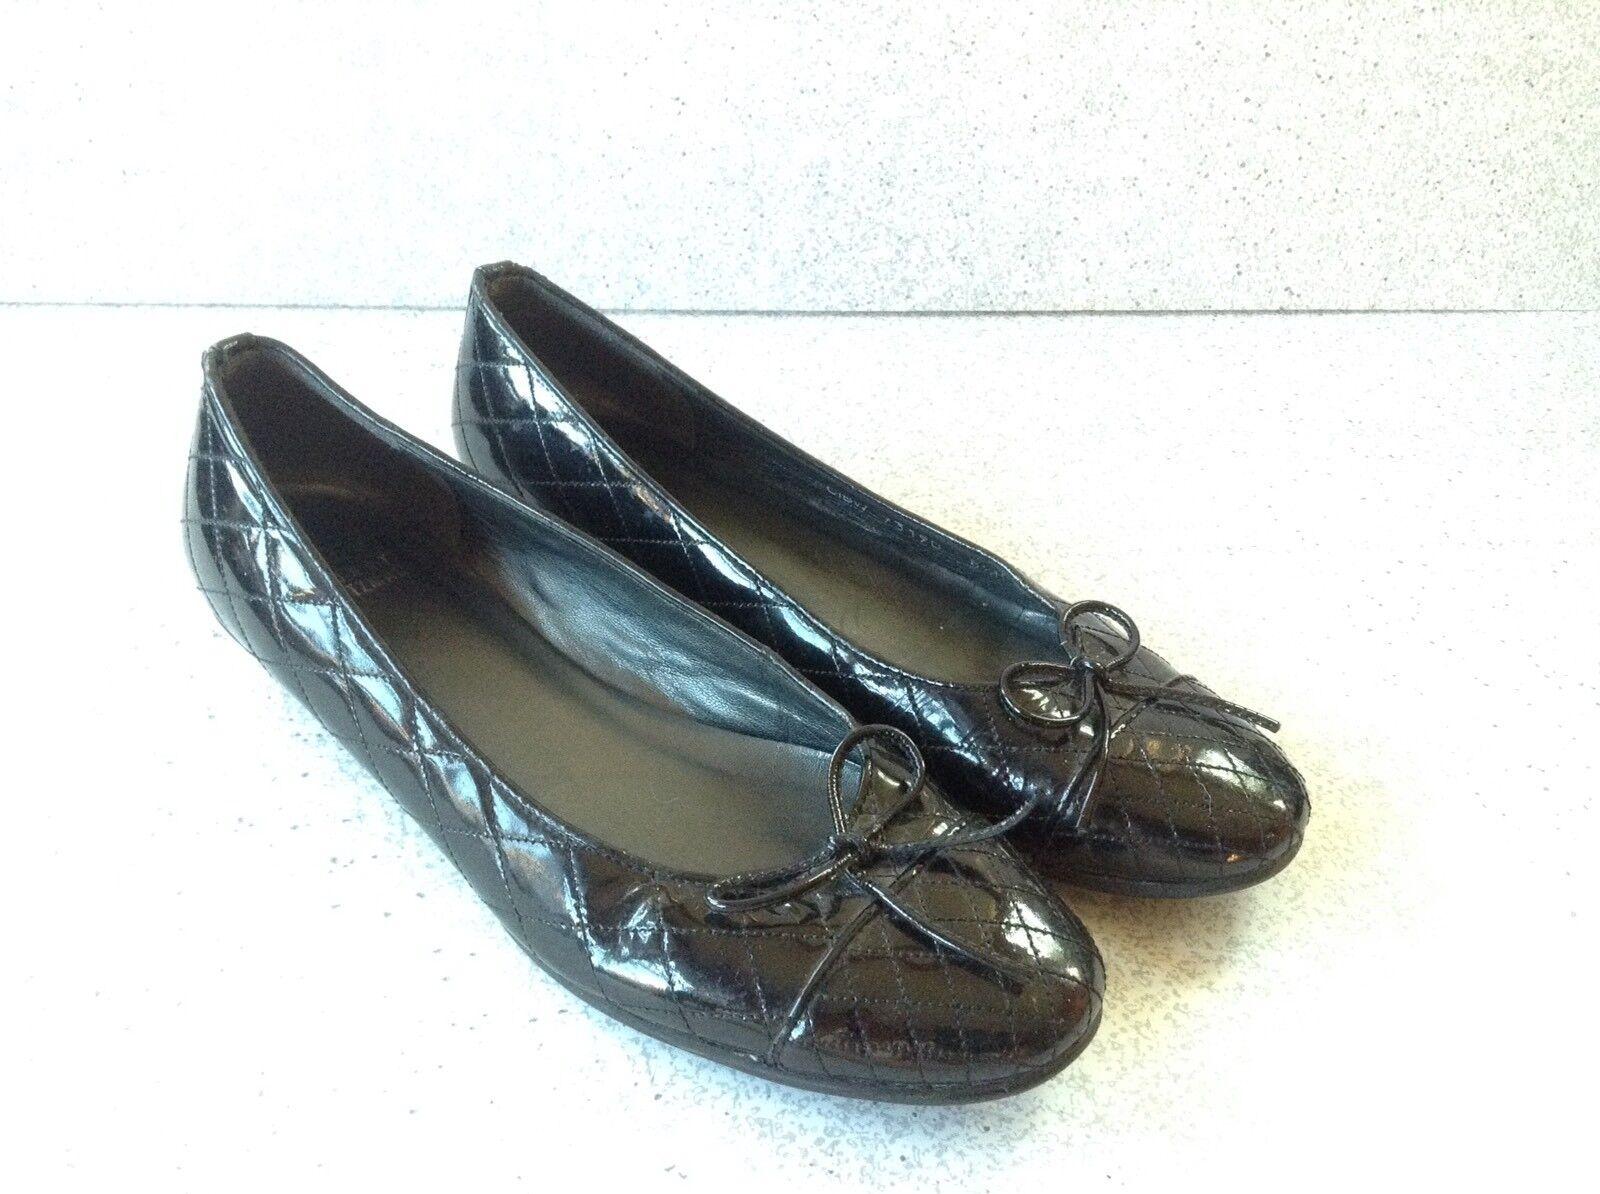 Stuart Weitzman Ballet Flats Quilted Black Patent Leather Cap Toe Size 8.5B